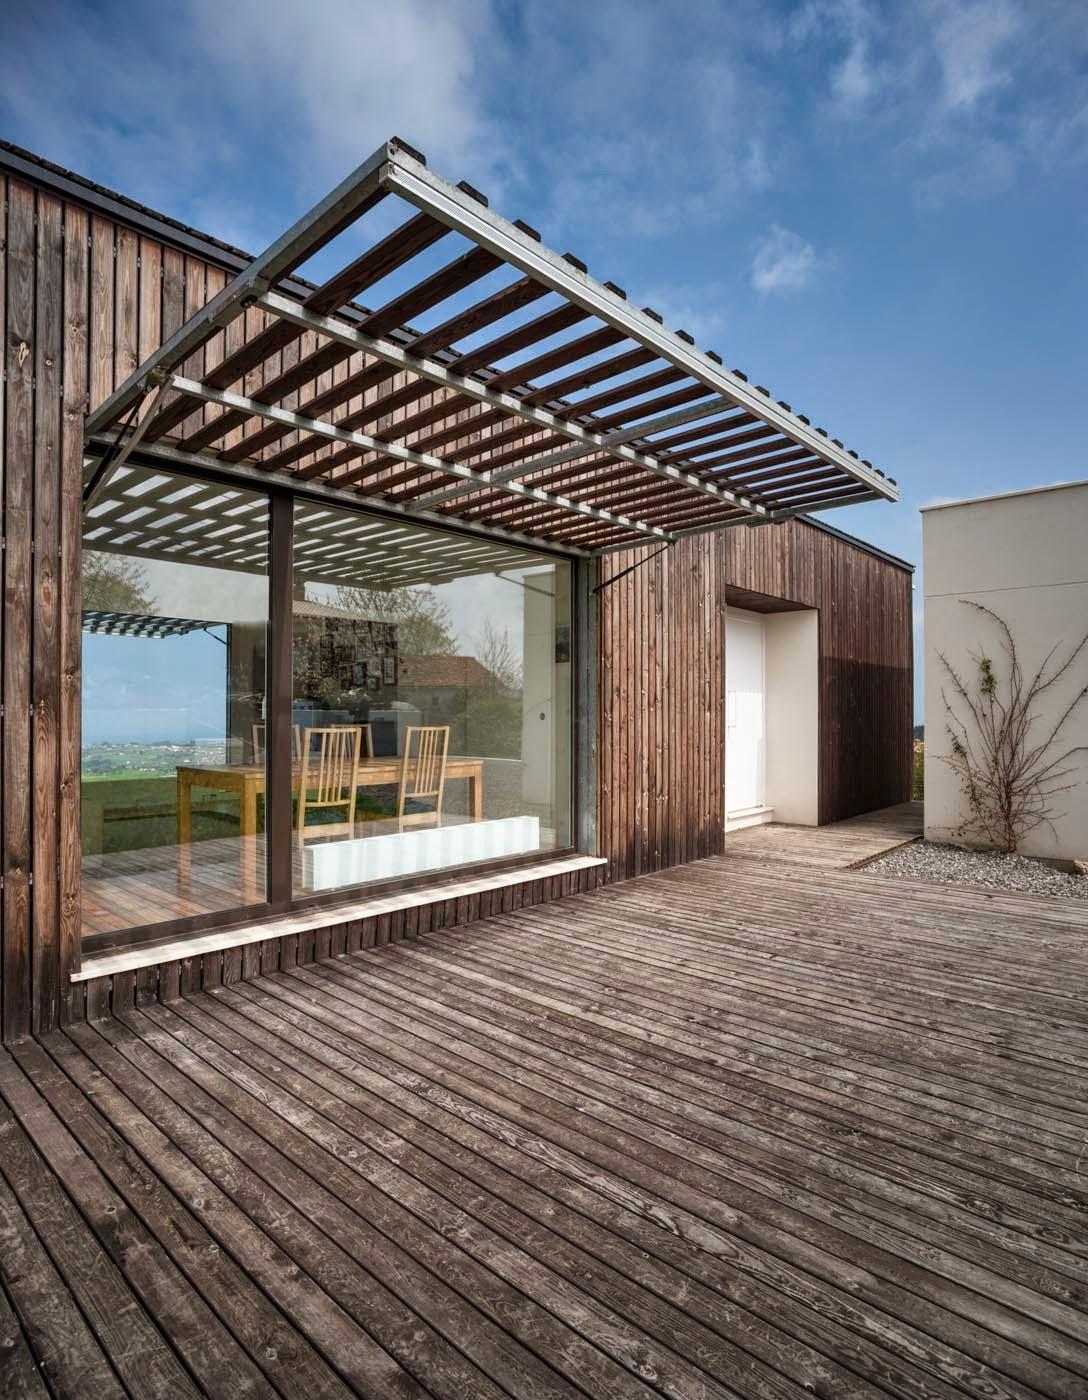 Vivienda bioclim tica en asturias modulo12 arquitectos - Arquitectos asturias ...